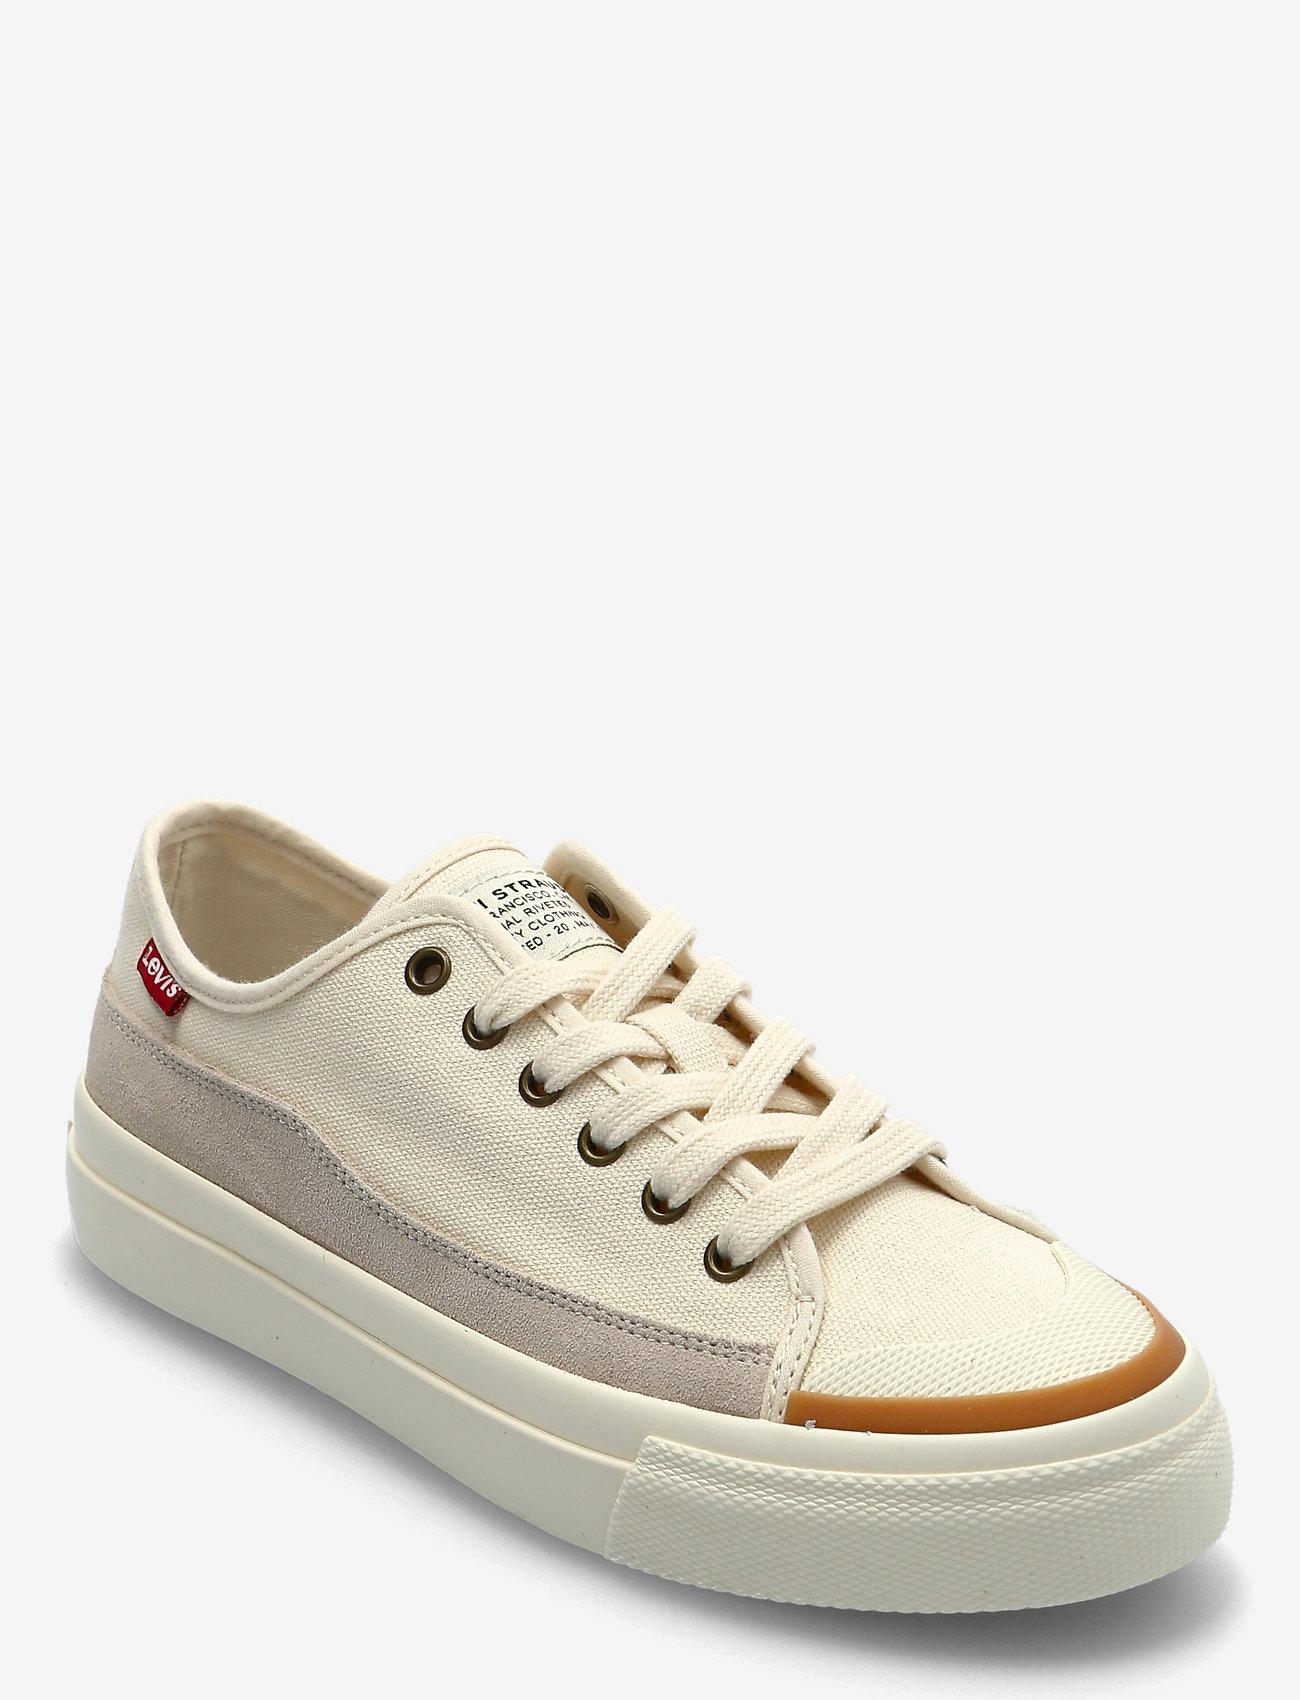 Levi's Shoes - SQUARE LOW S - lave sneakers - ecru - 0